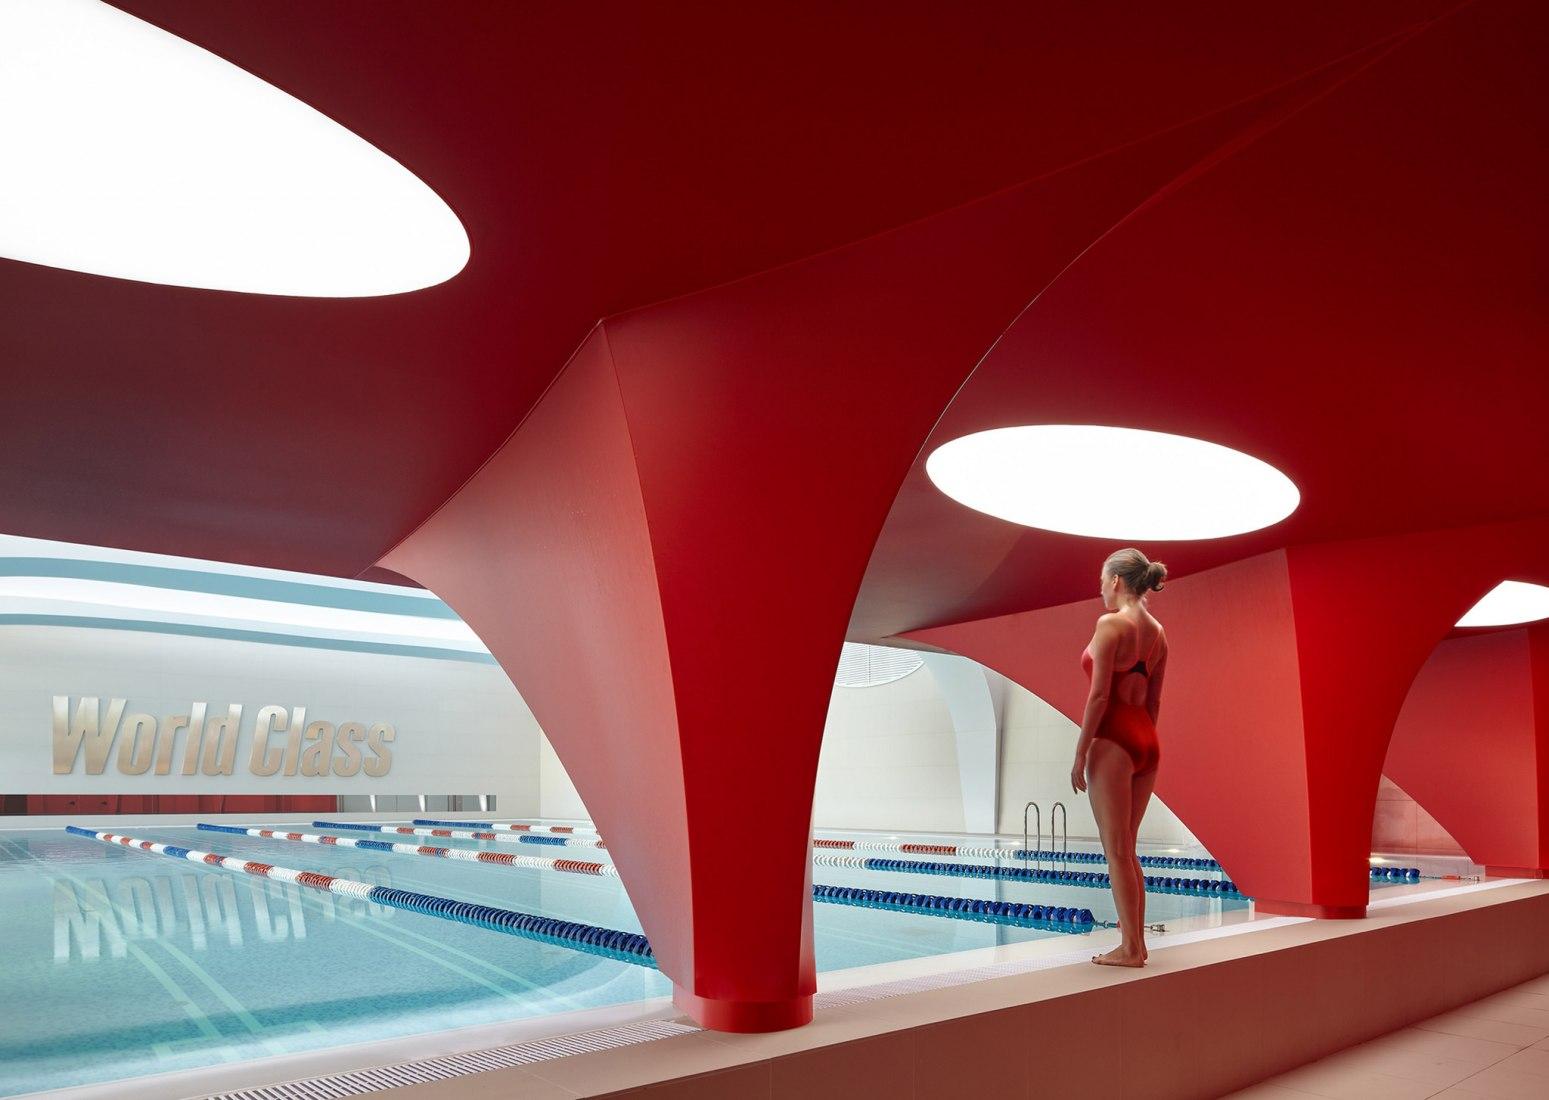 World Class Olympic por VOX Architects. Fotografía © Sergey Ananiev